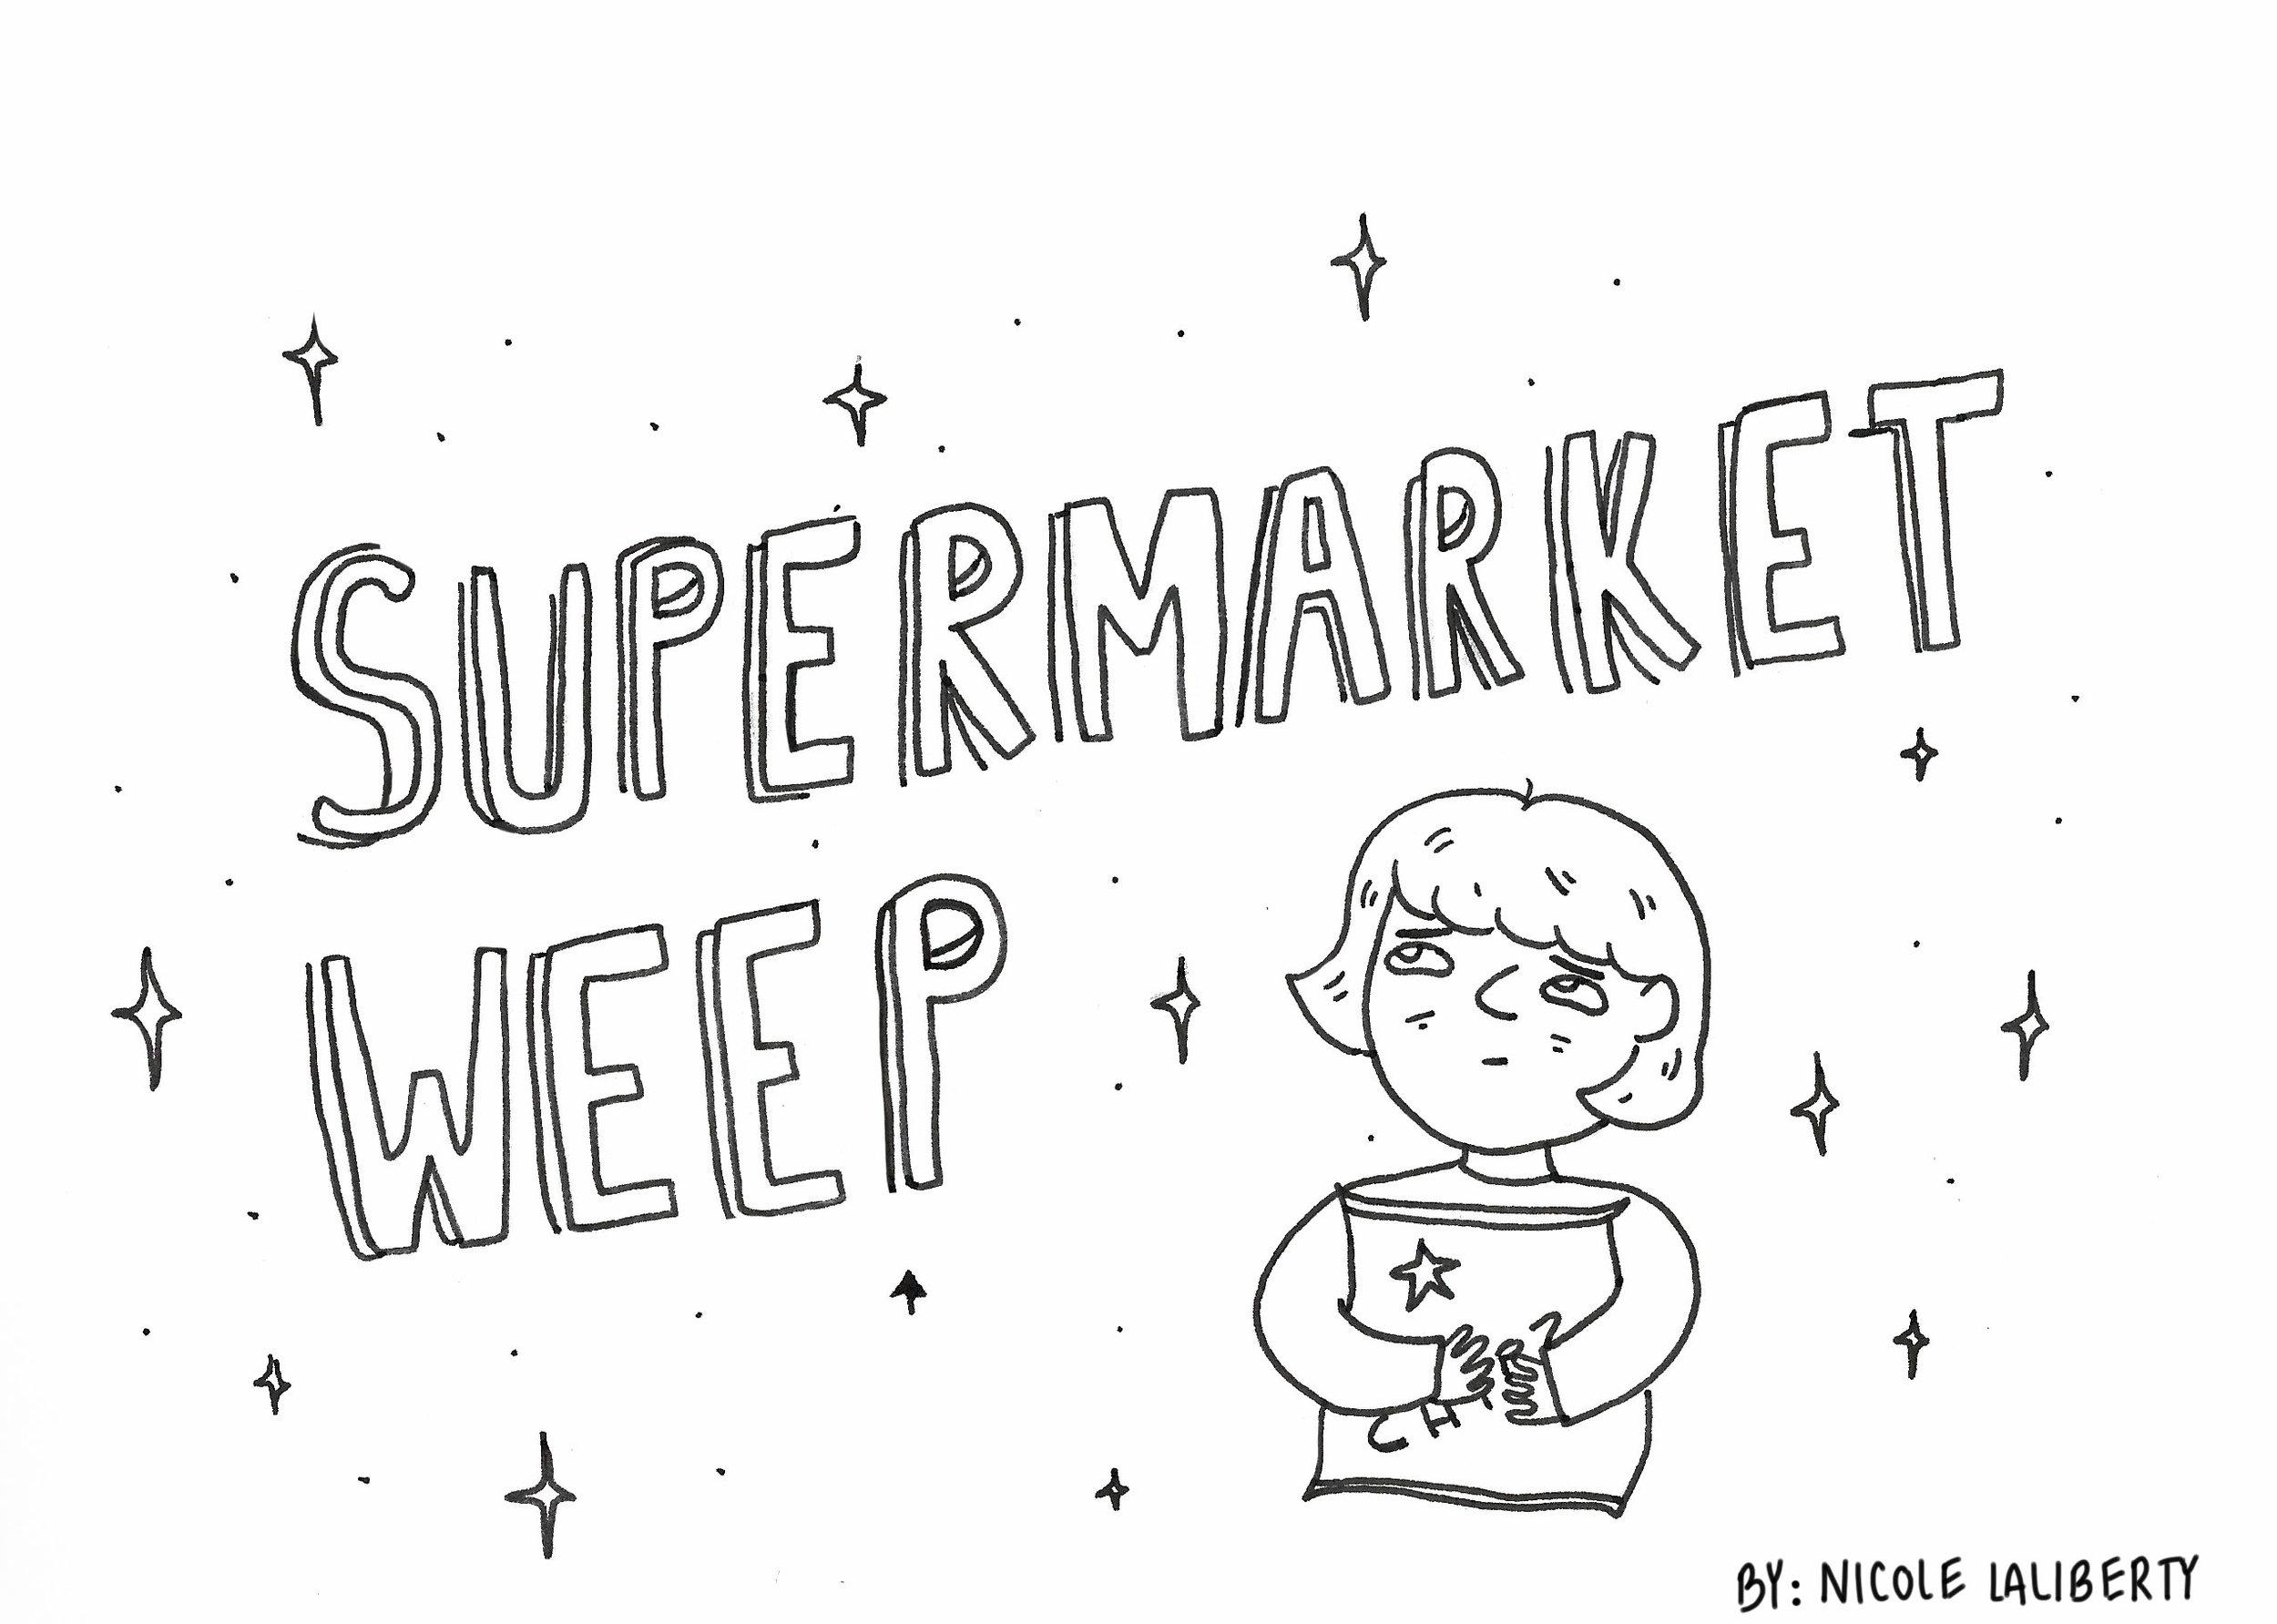 Supermarket Weep (Comic)